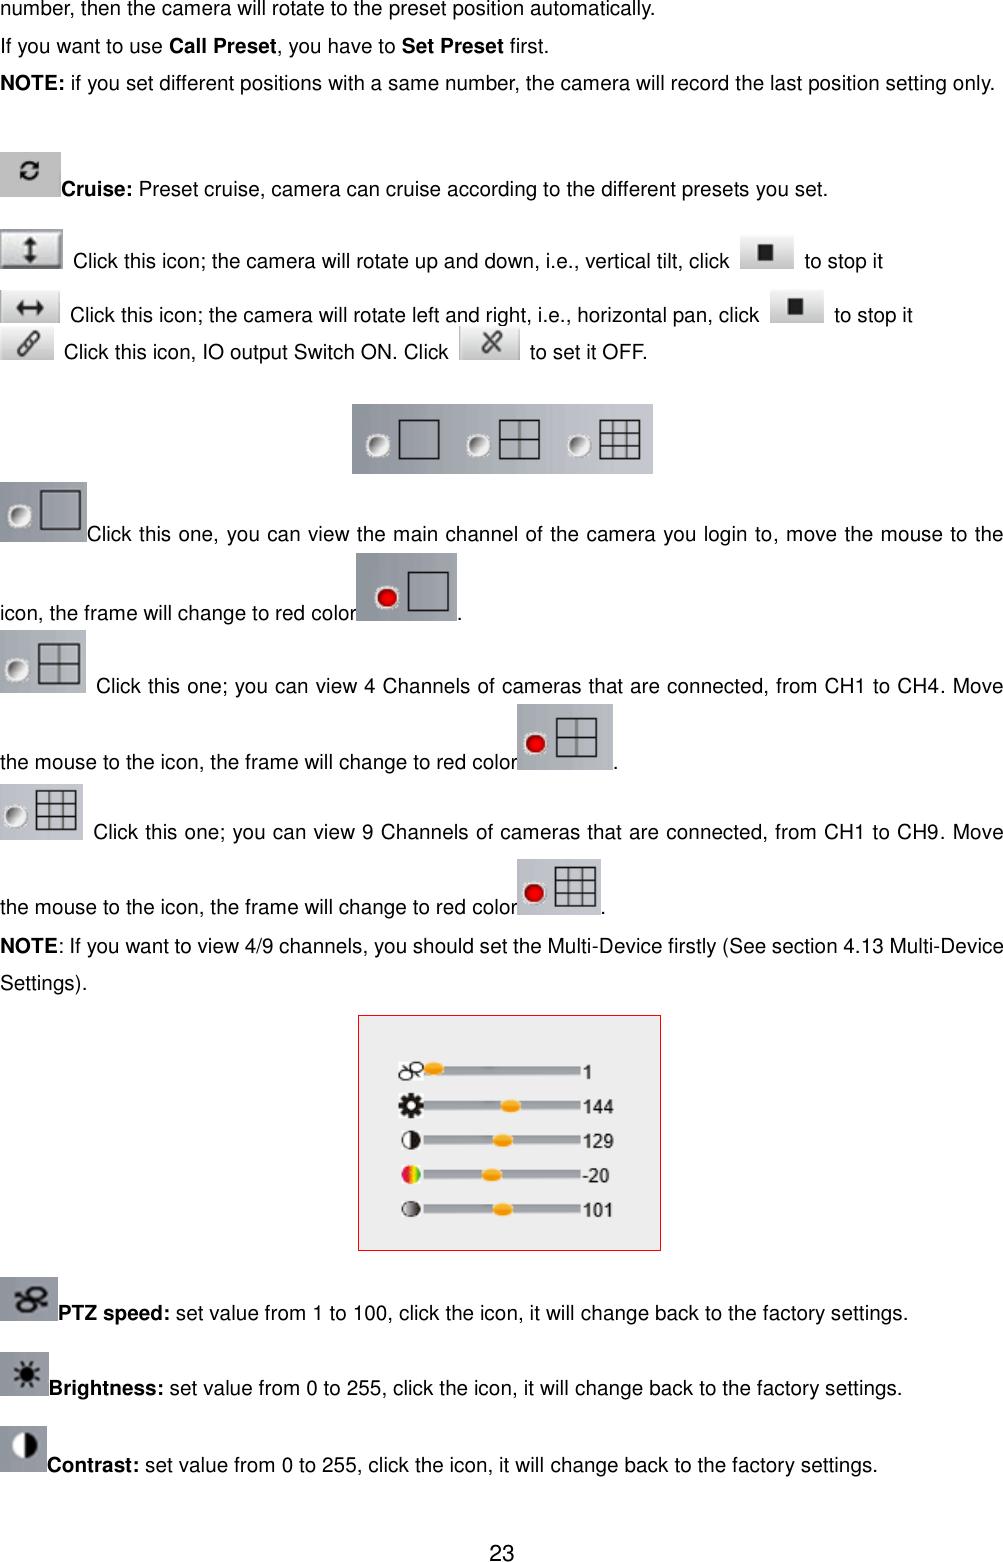 hfm user guide 11.1 2.4 pdf